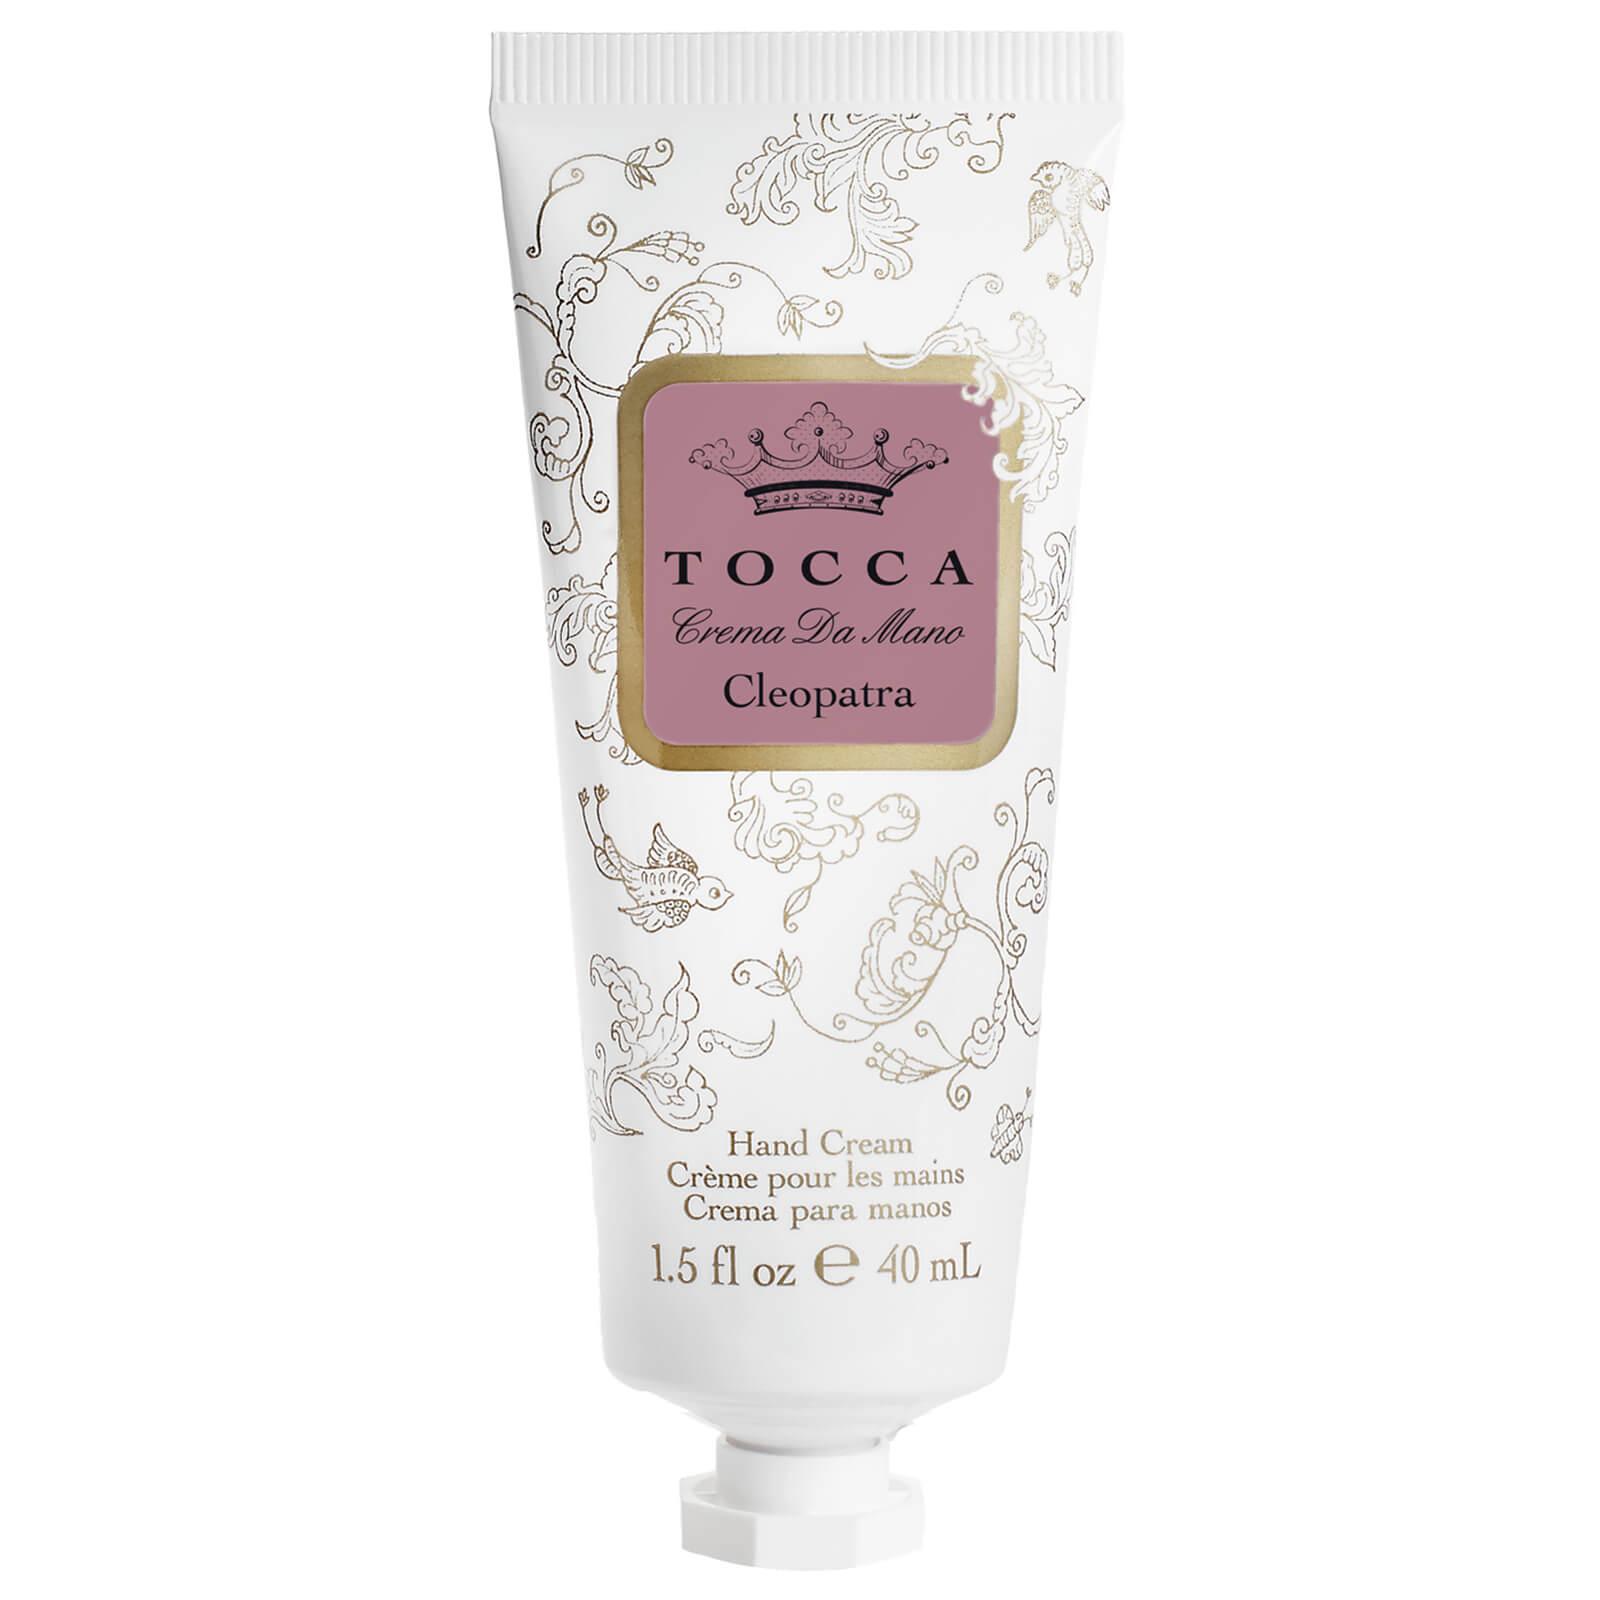 Tocca Cleopatra Hand Cream 40ml